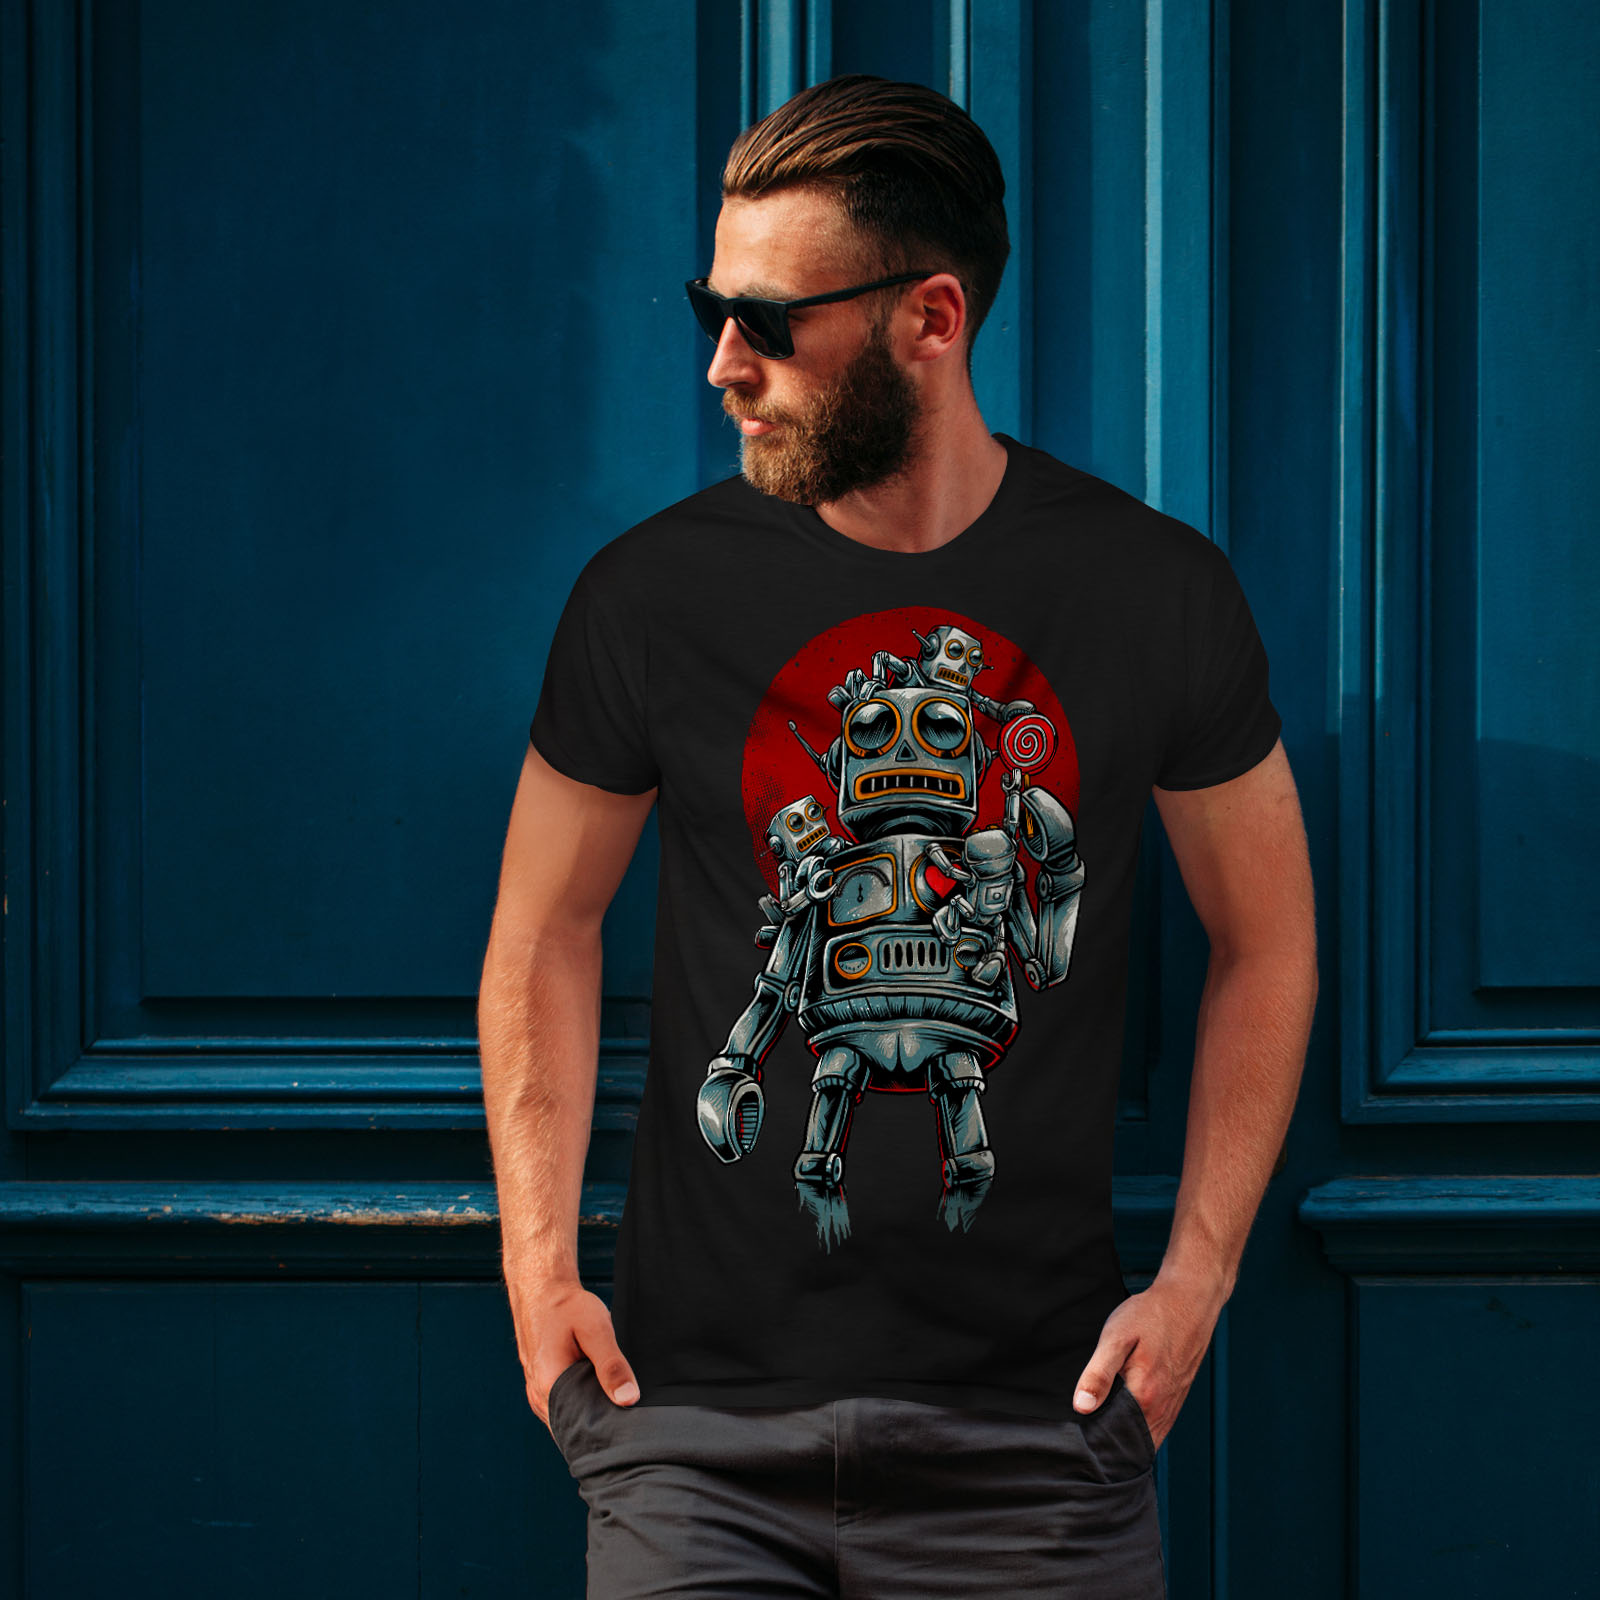 miniature 4 - Wellcoda Crazy Robot Mens T-shirt, Mechanical Graphic Design Printed Tee